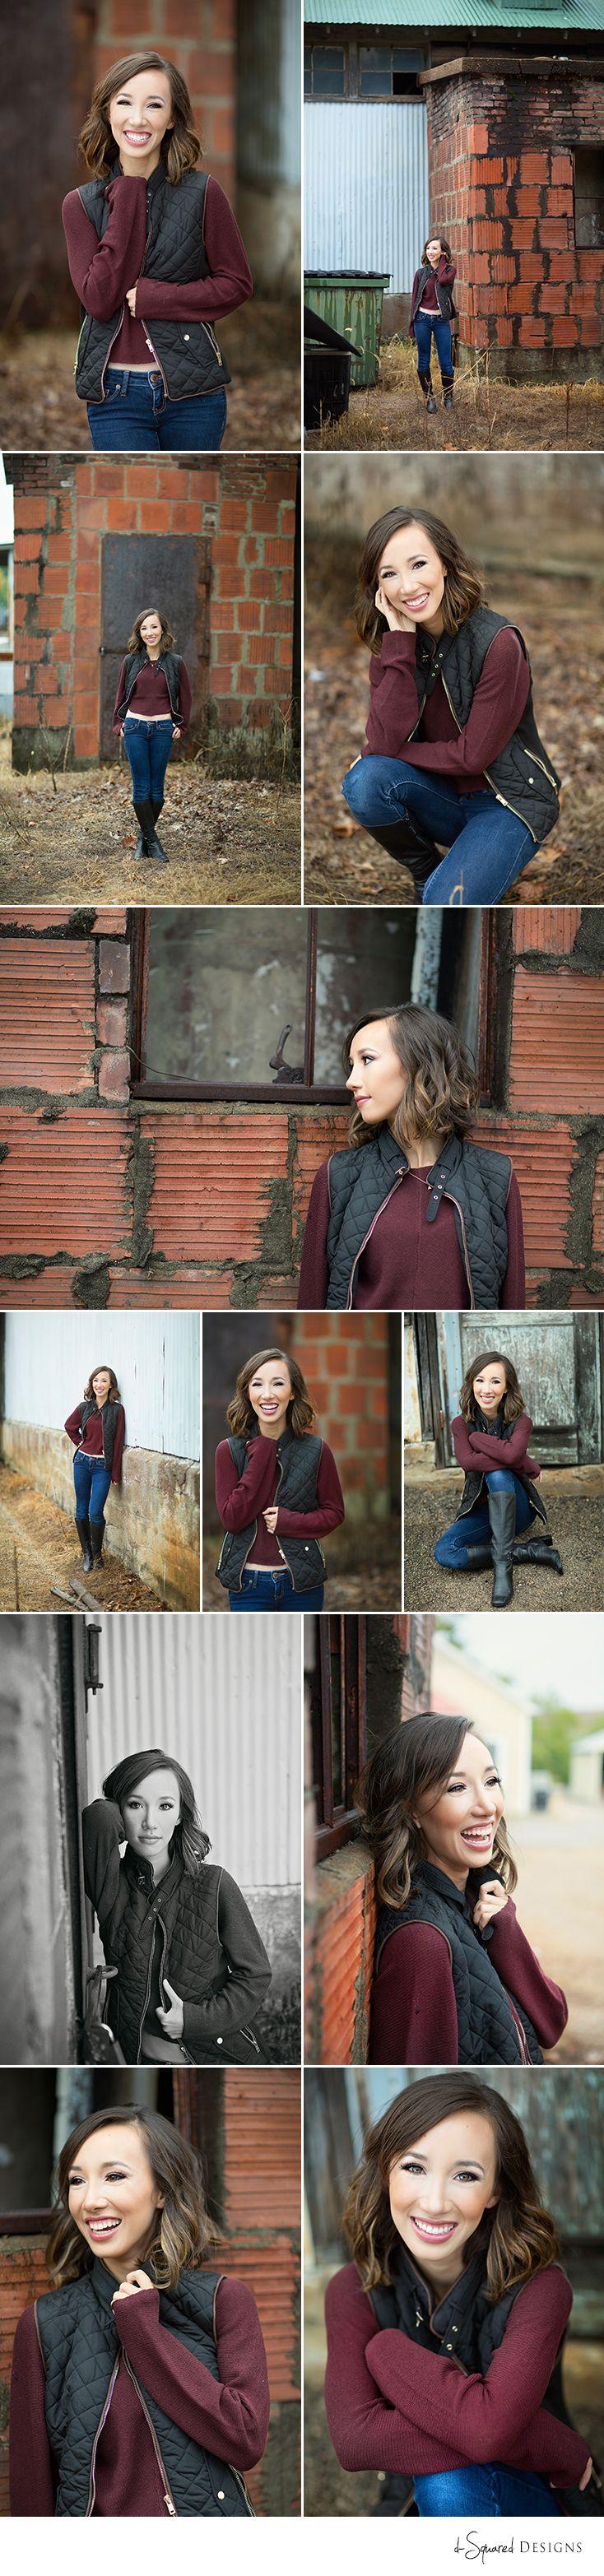 d-Squared Designs St. Louis, MO Senior Photography. Urban senior photography. Brick wall. Gorgeous senior.